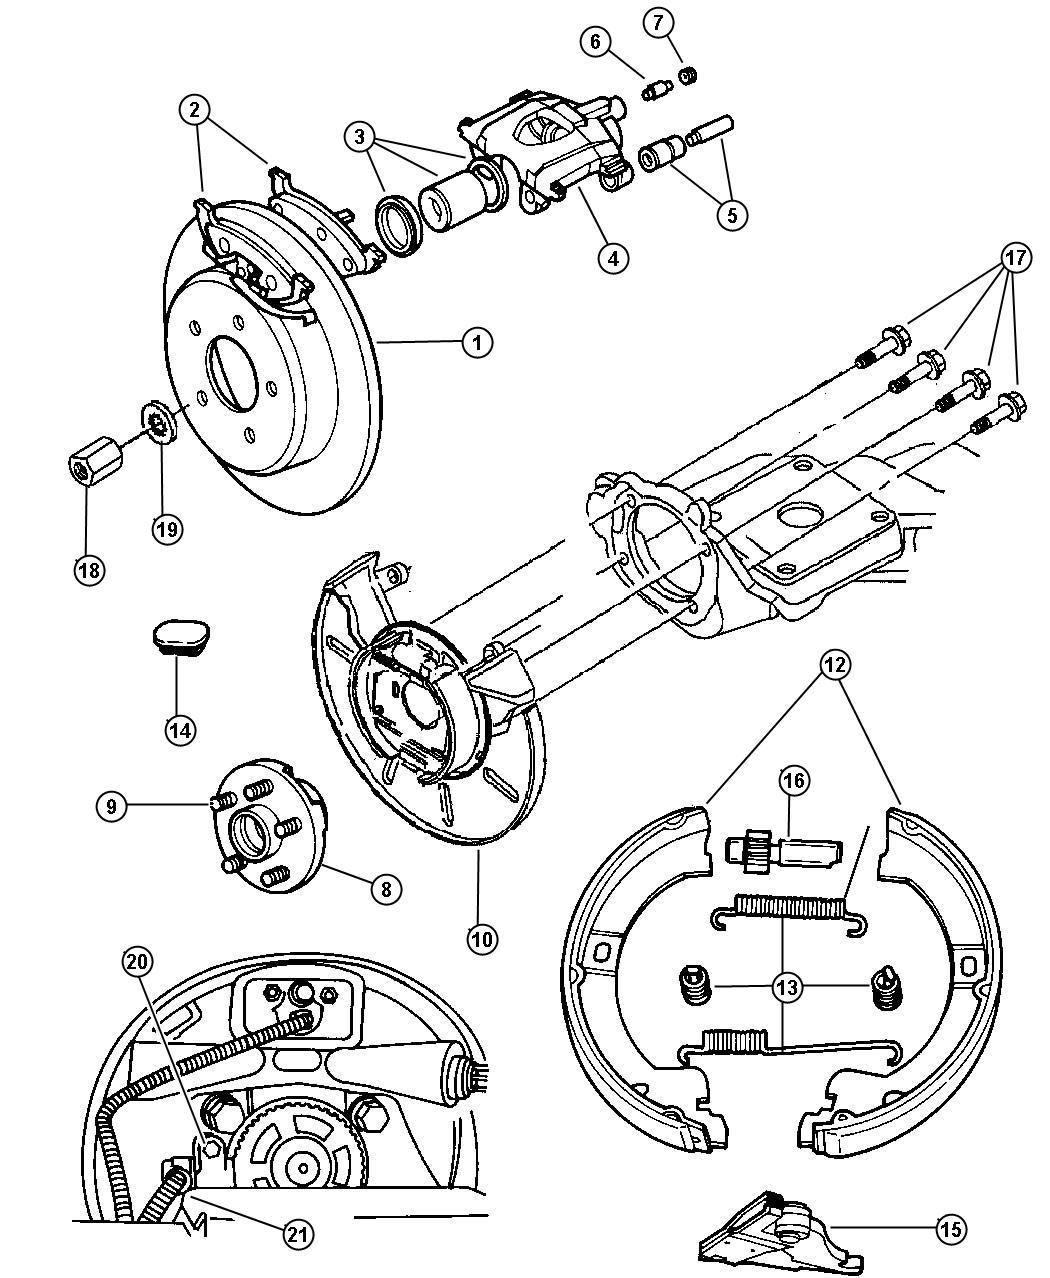 2003 Dodge Grand Caravan Lever  Parking Brake